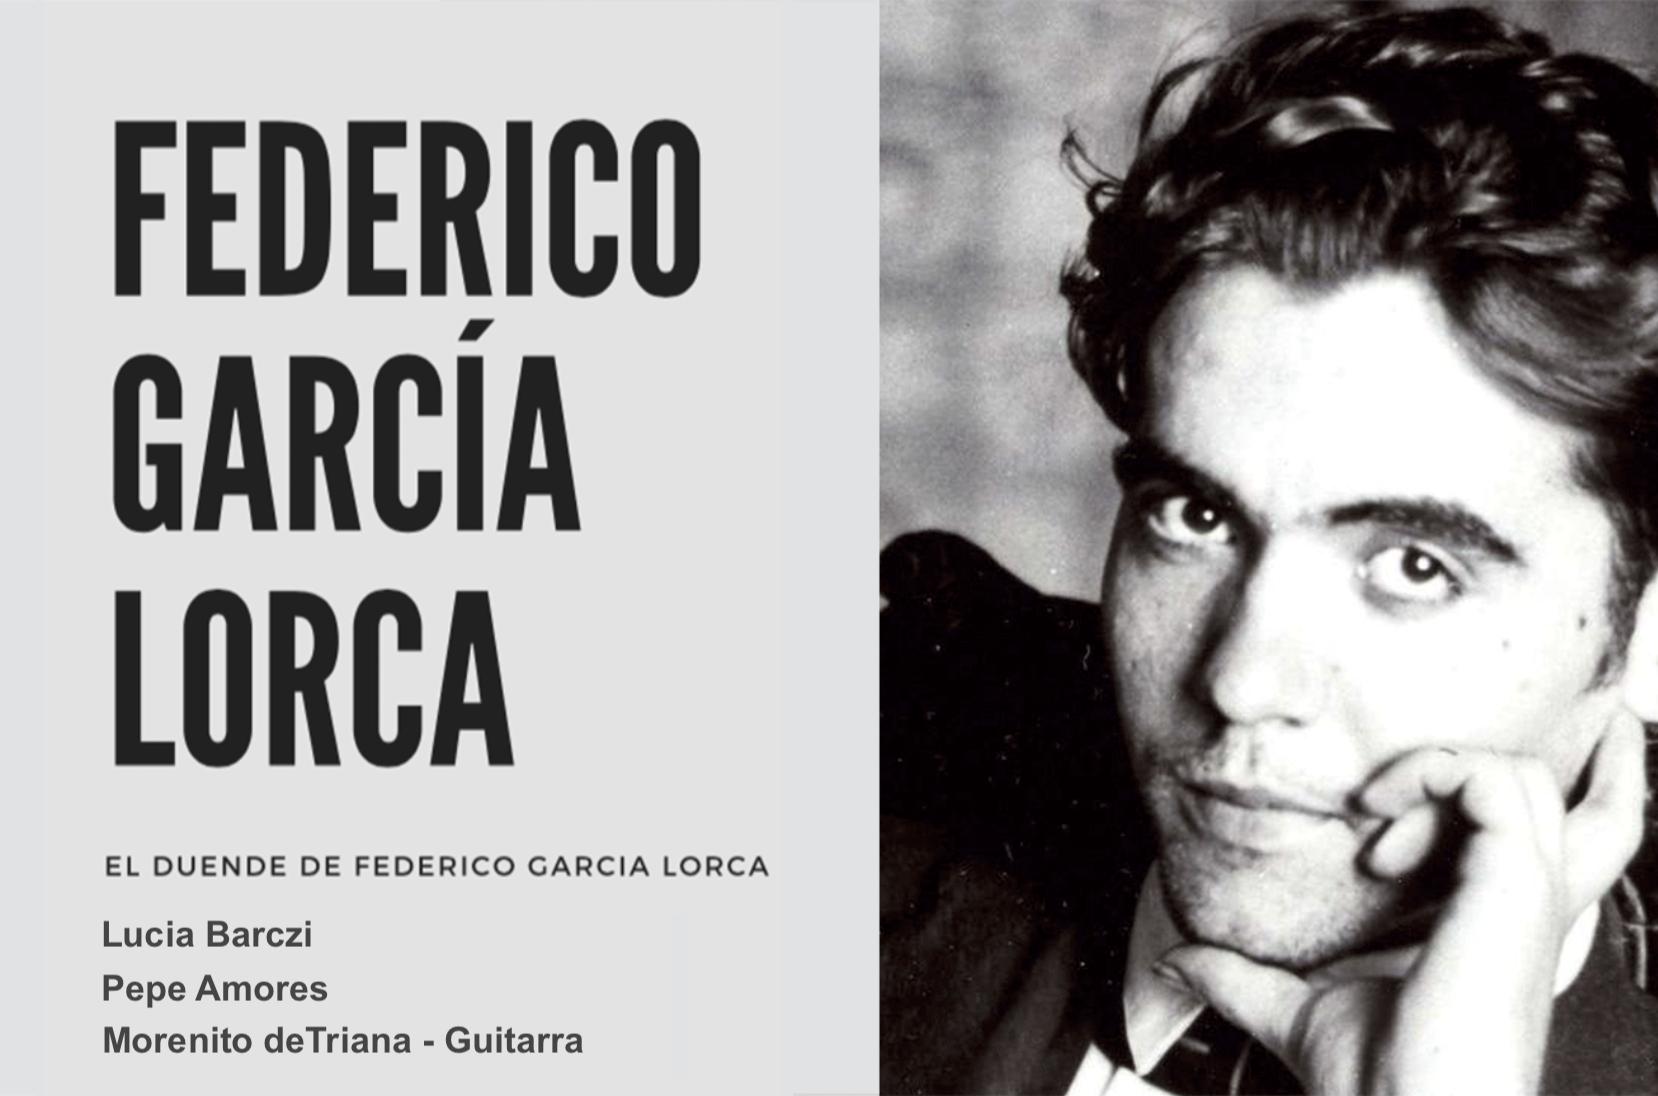 20:00 recitál Frederico Garcia Lorca